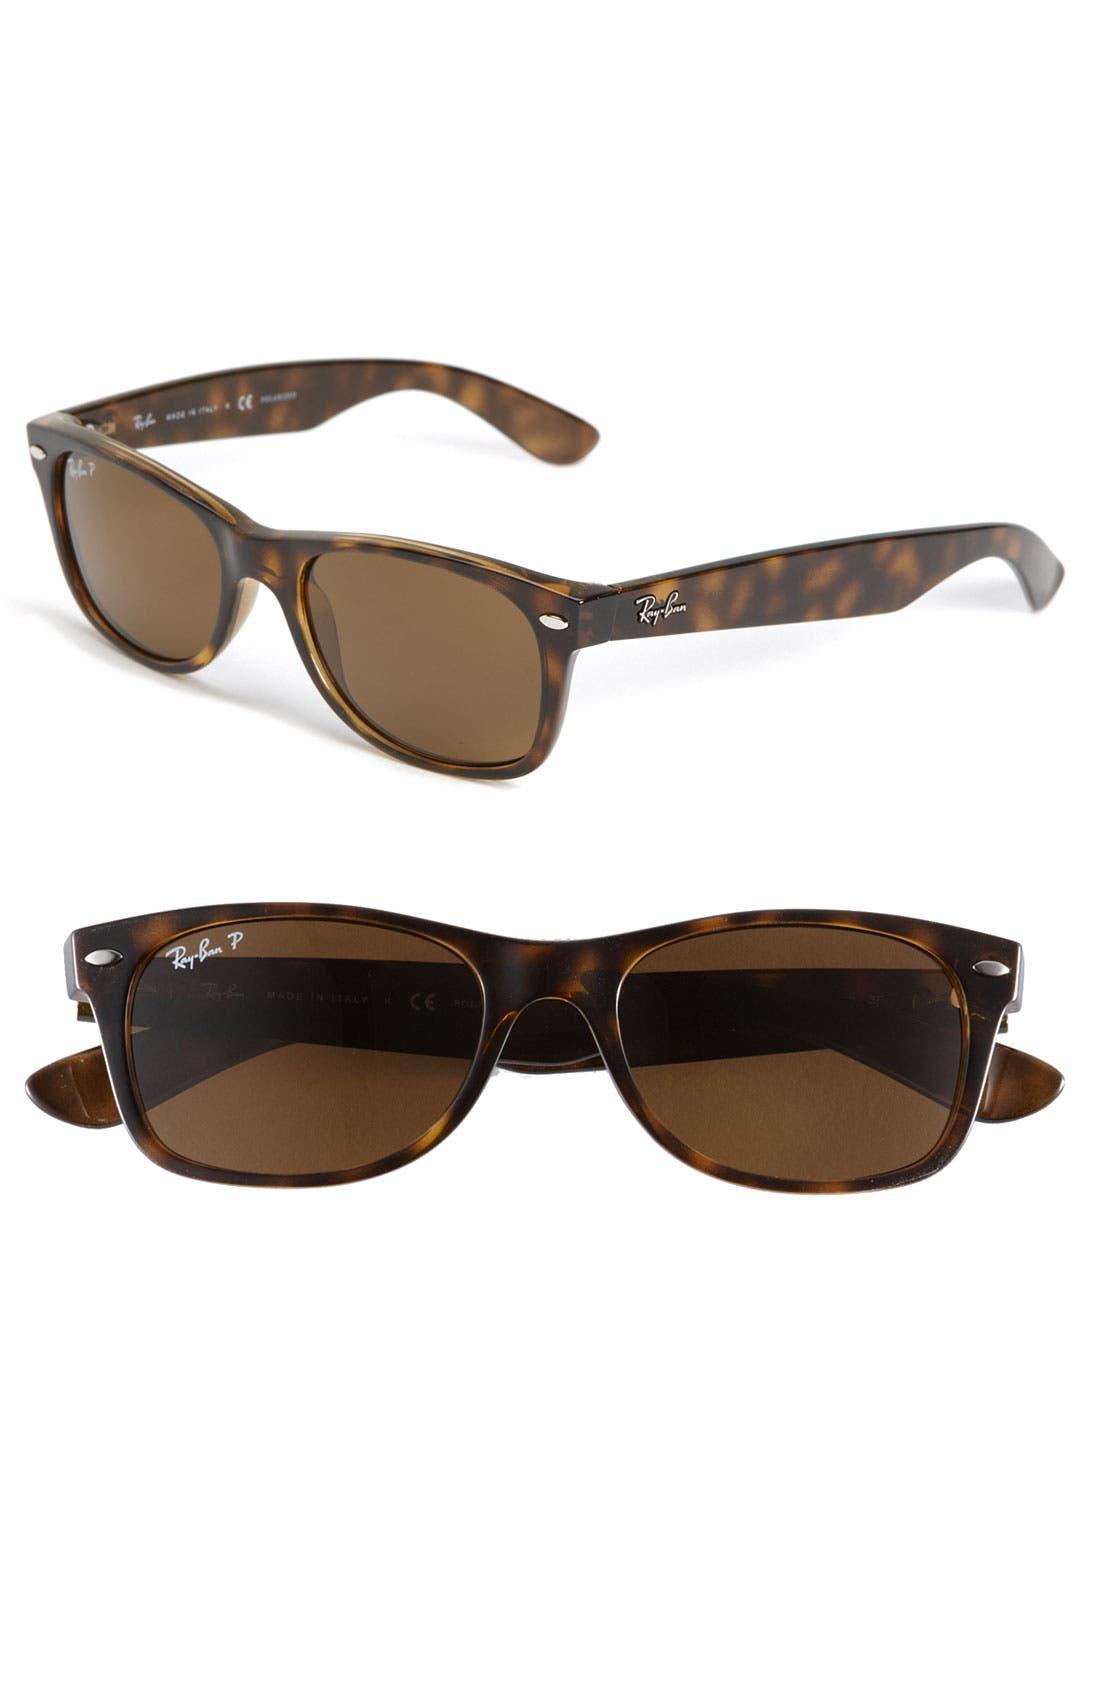 Main Image - Ray-Ban Standard New Wayfarer 55mm Polarized Sunglasses